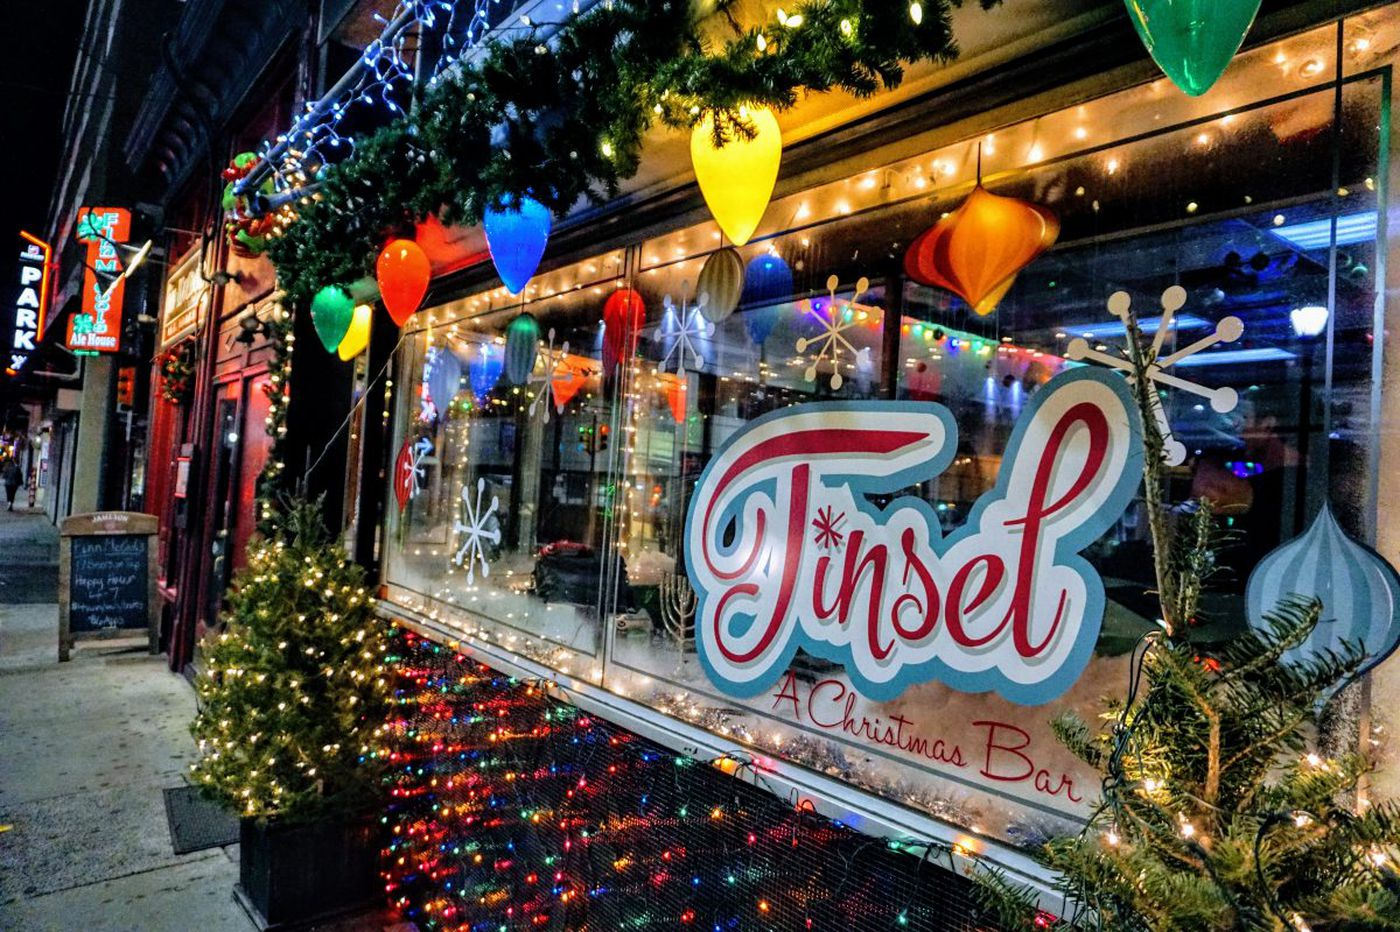 Christmas pop-up bar in Midtown Village